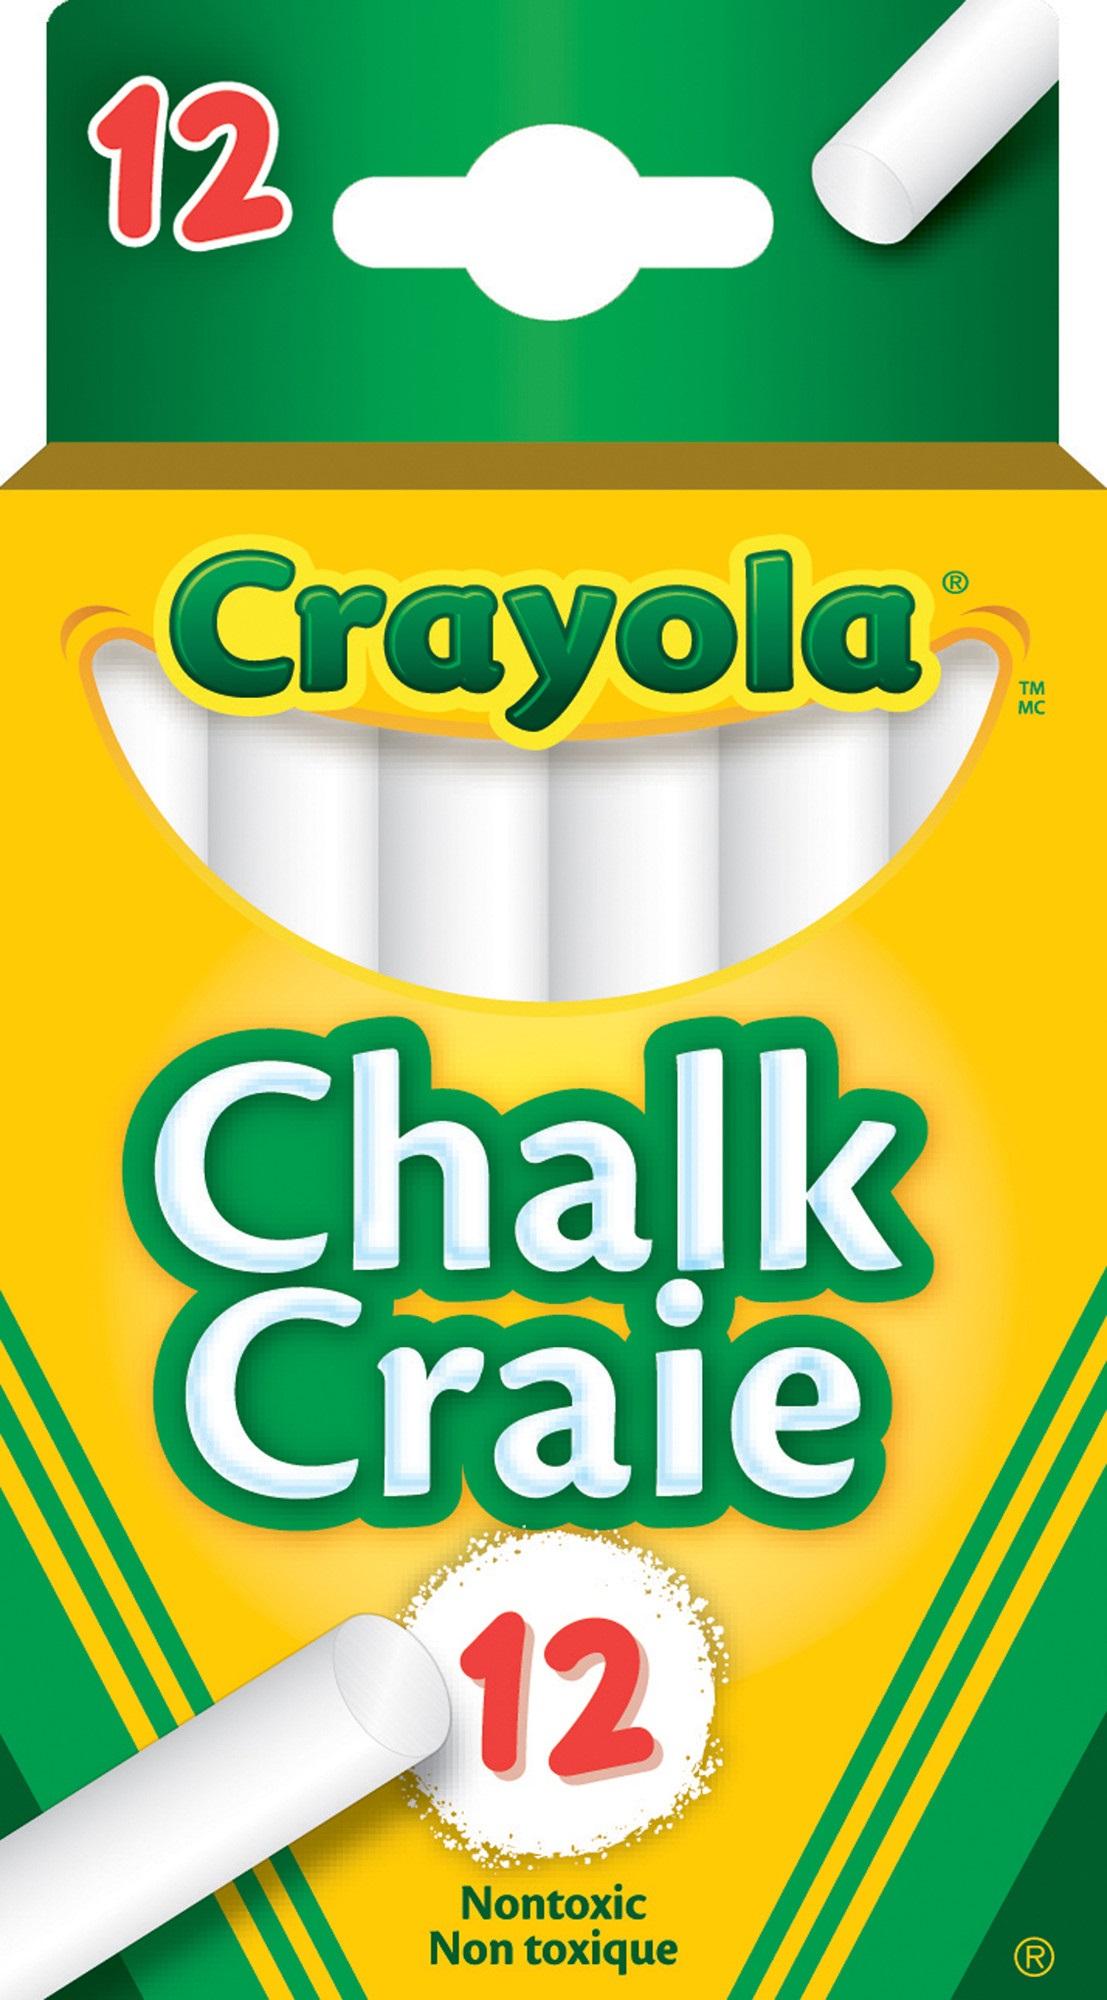 Crayola Chalk Dustless 510312 - White - 12/box